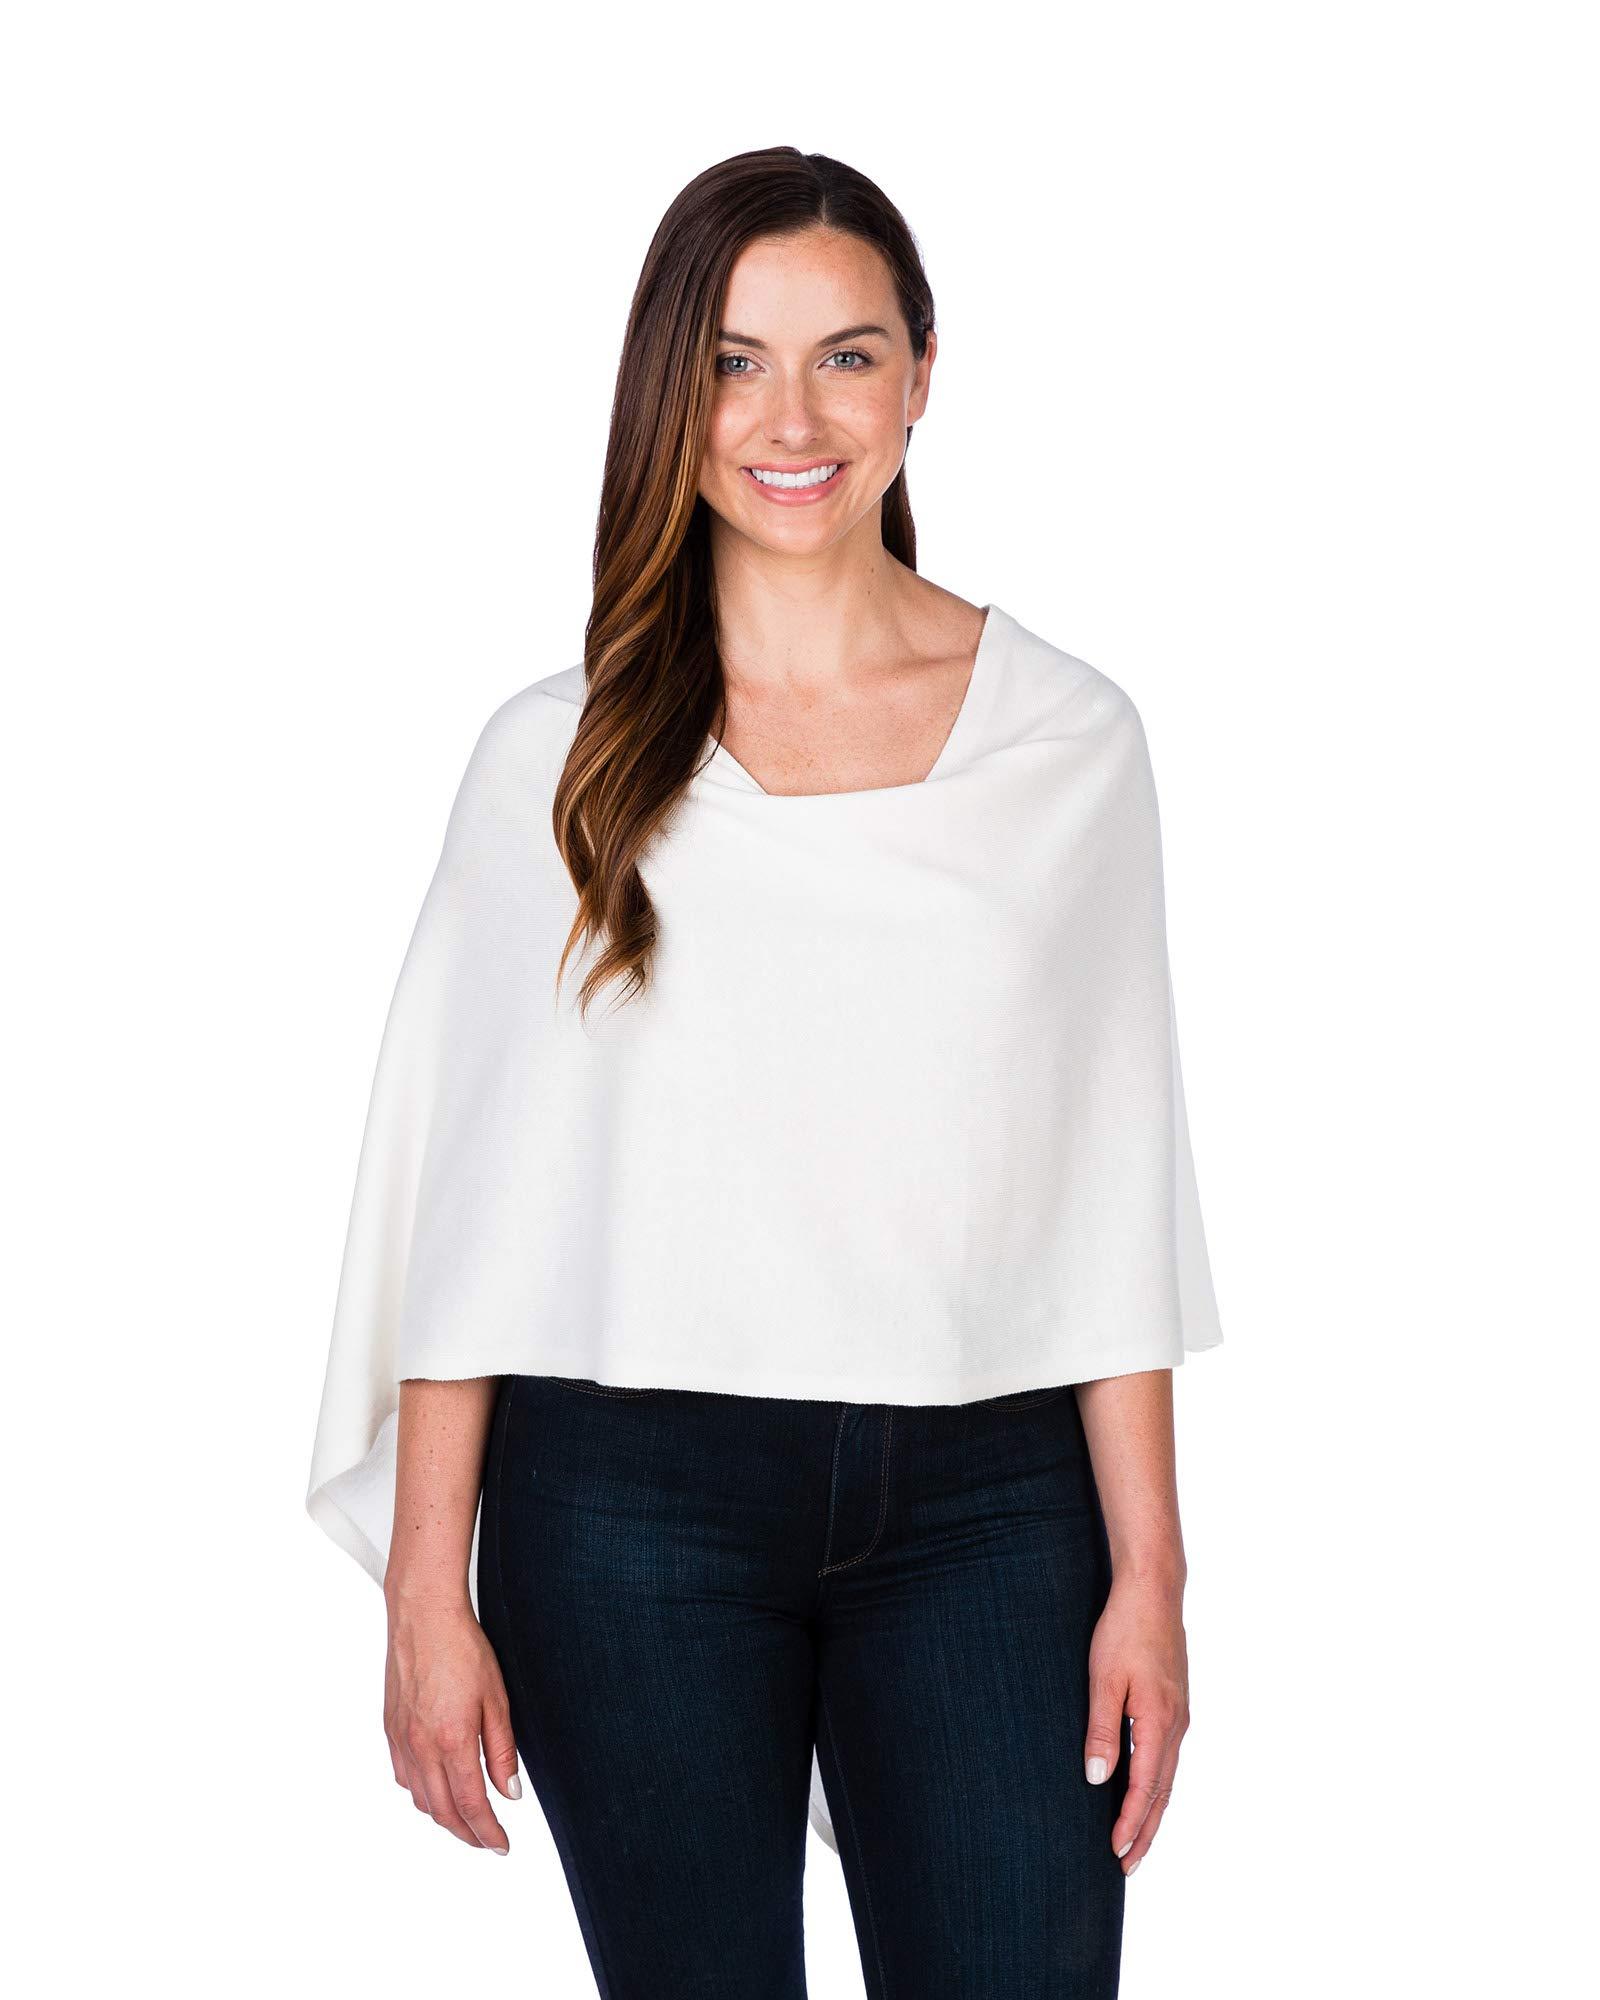 Caroline Grace by Alashan Trade Wind Cashmere Blend Dress Topper Poncho - White